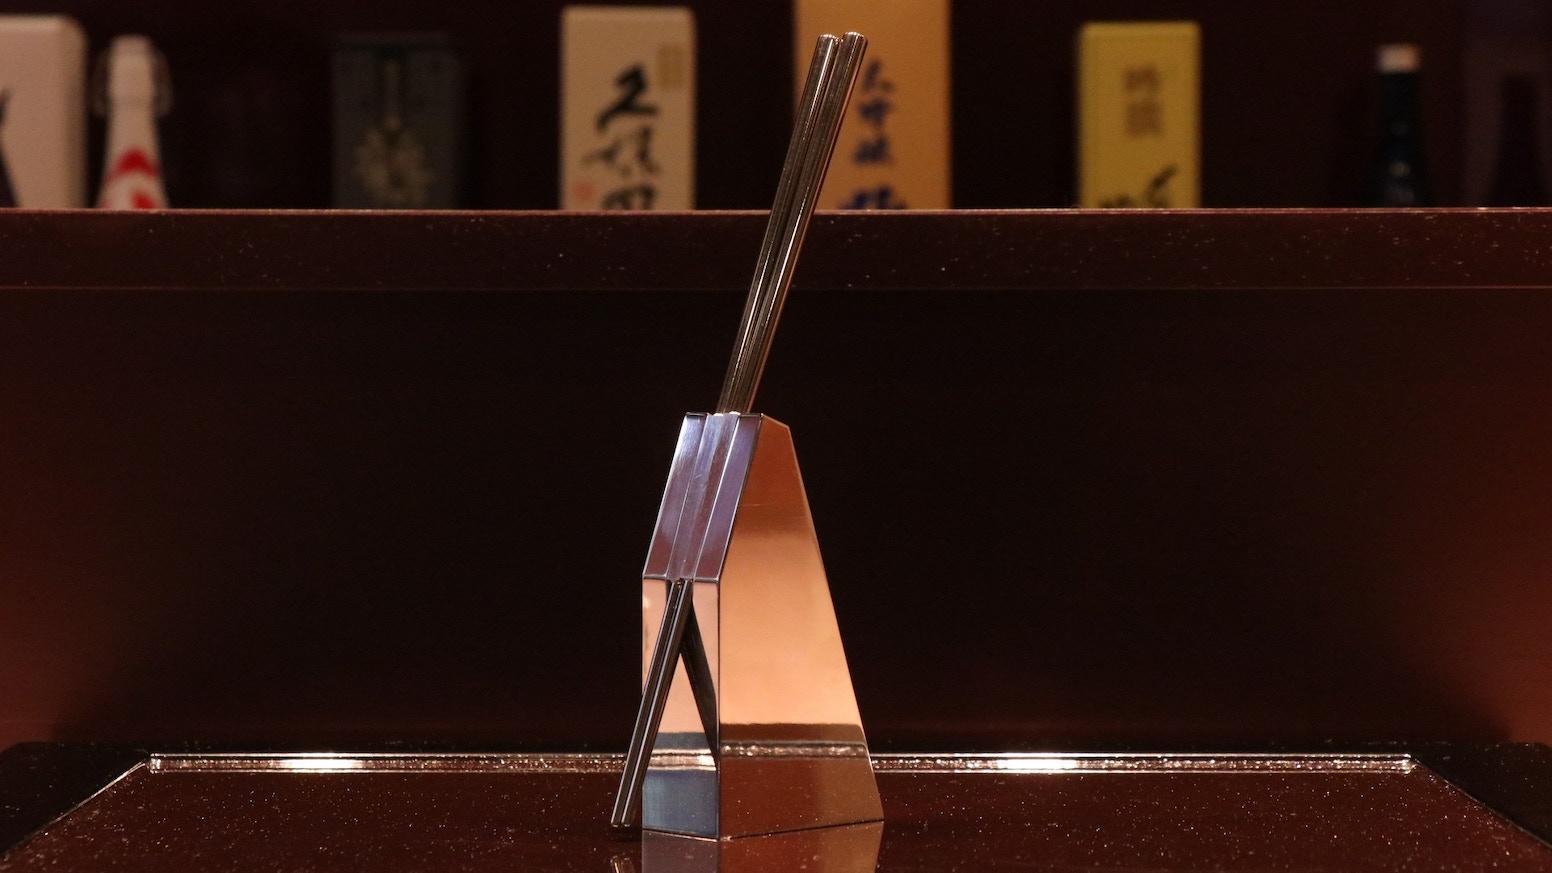 Making an unique style of chopsticks and stand from Tsubame City, JAPAN. iPodの鏡面仕上げなどで知られる新潟県燕市の技術を活かし、新しいスタイルのお箸とスタンドを制作します。